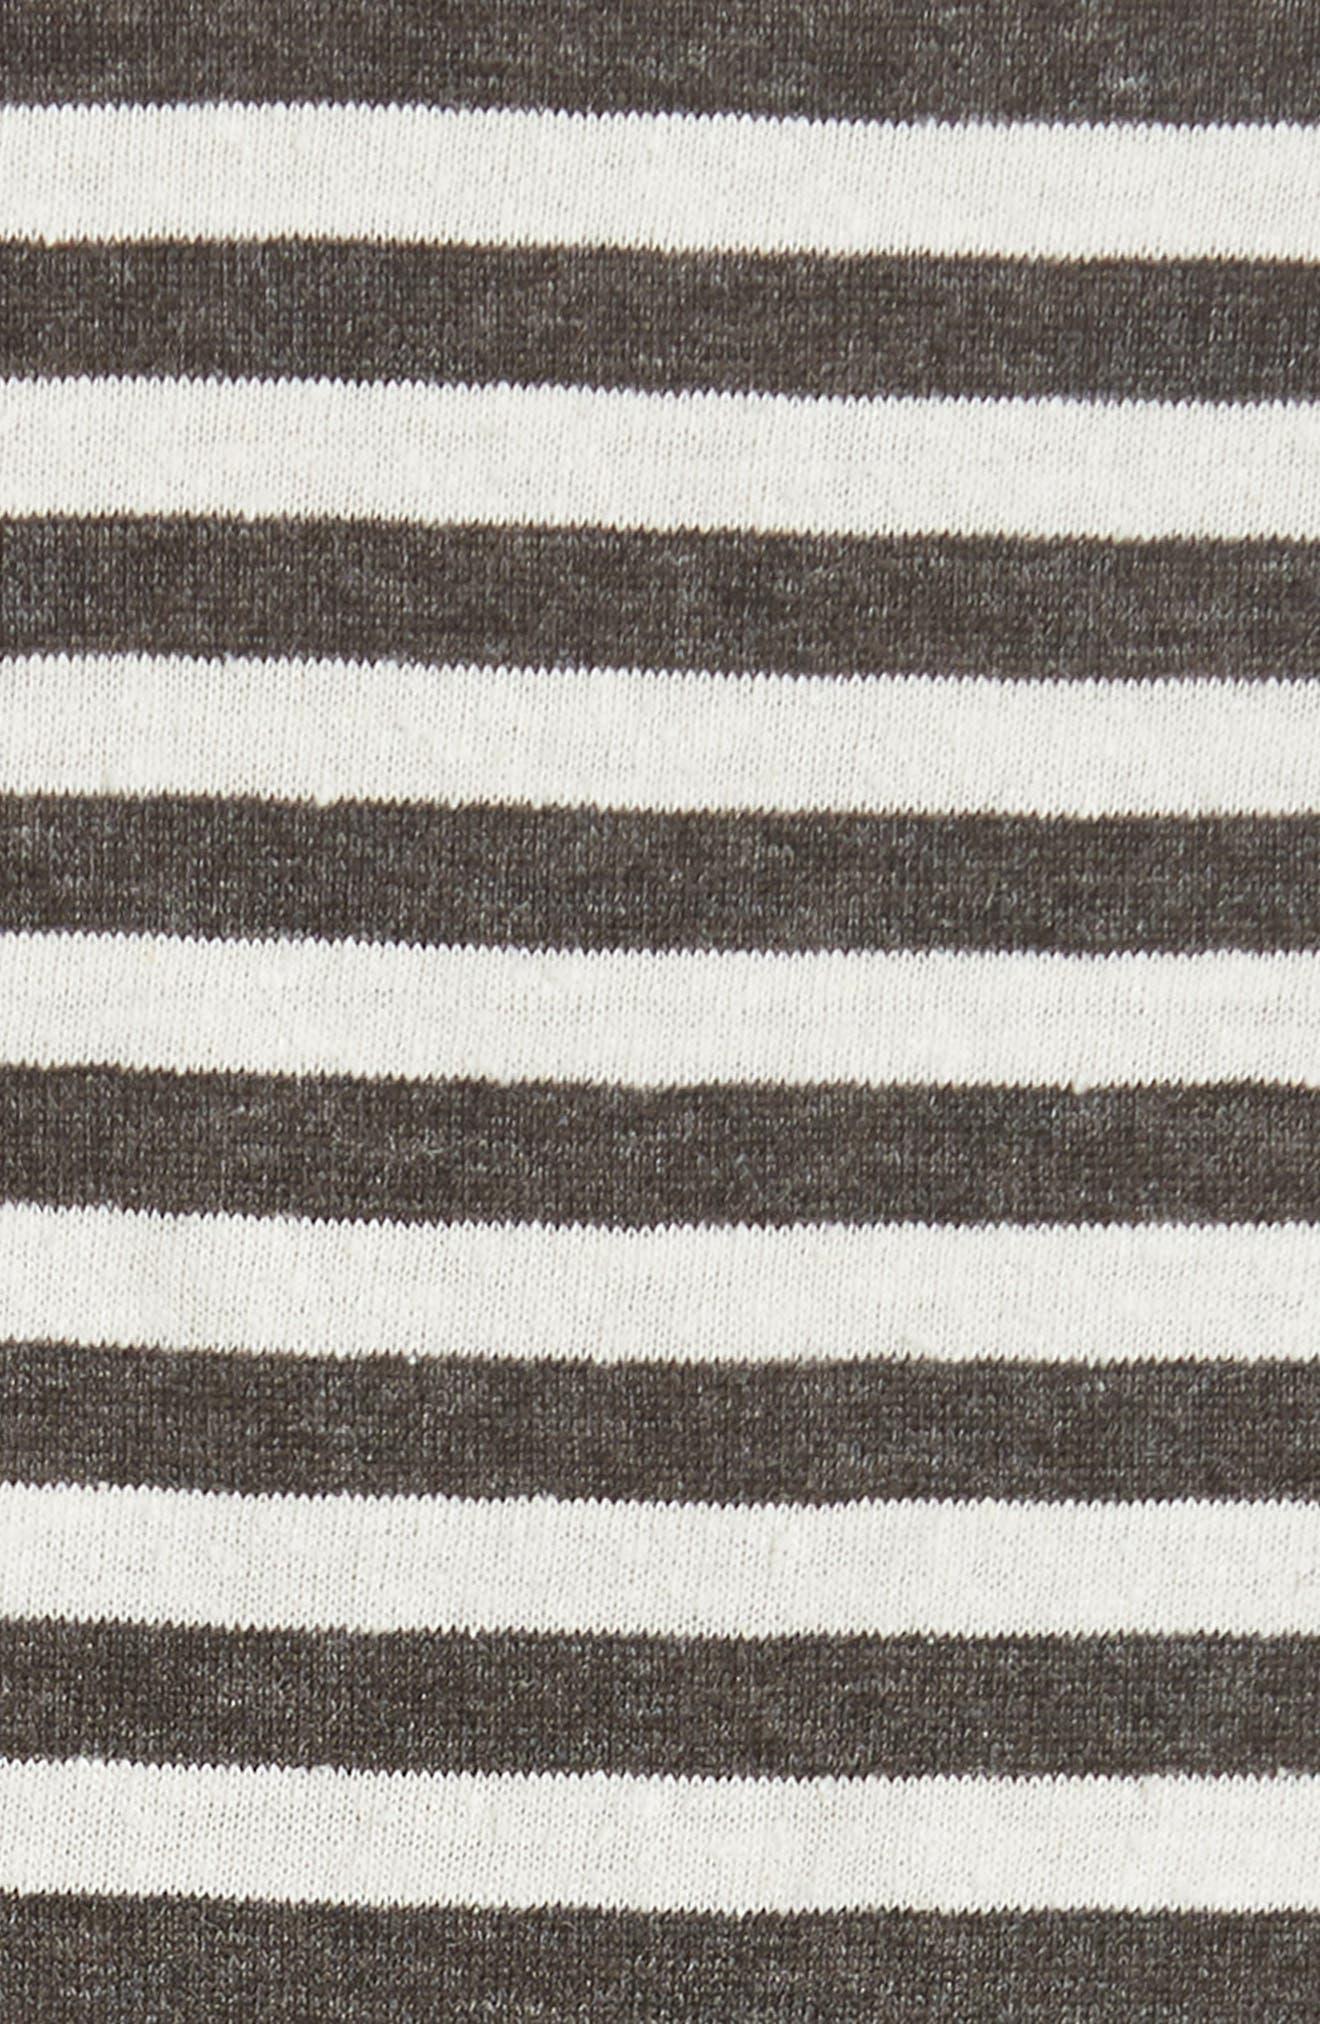 Stripe Crop Tee,                             Alternate thumbnail 5, color,                             NATURAL/ IRON